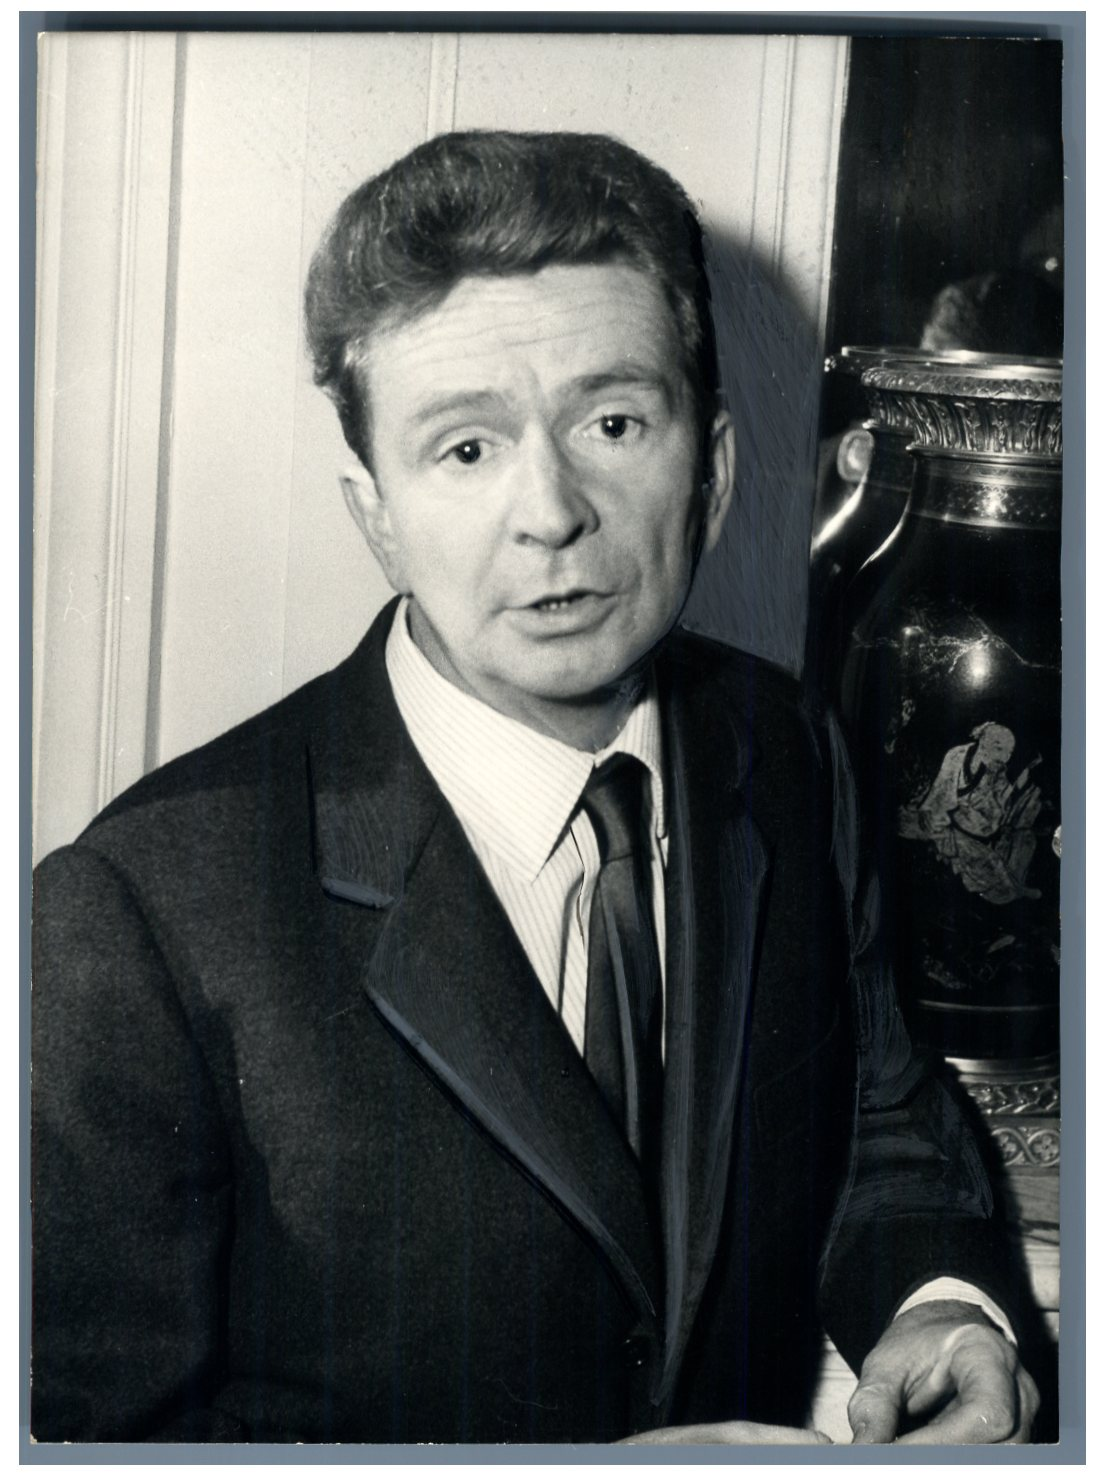 Jarlot,Gérard